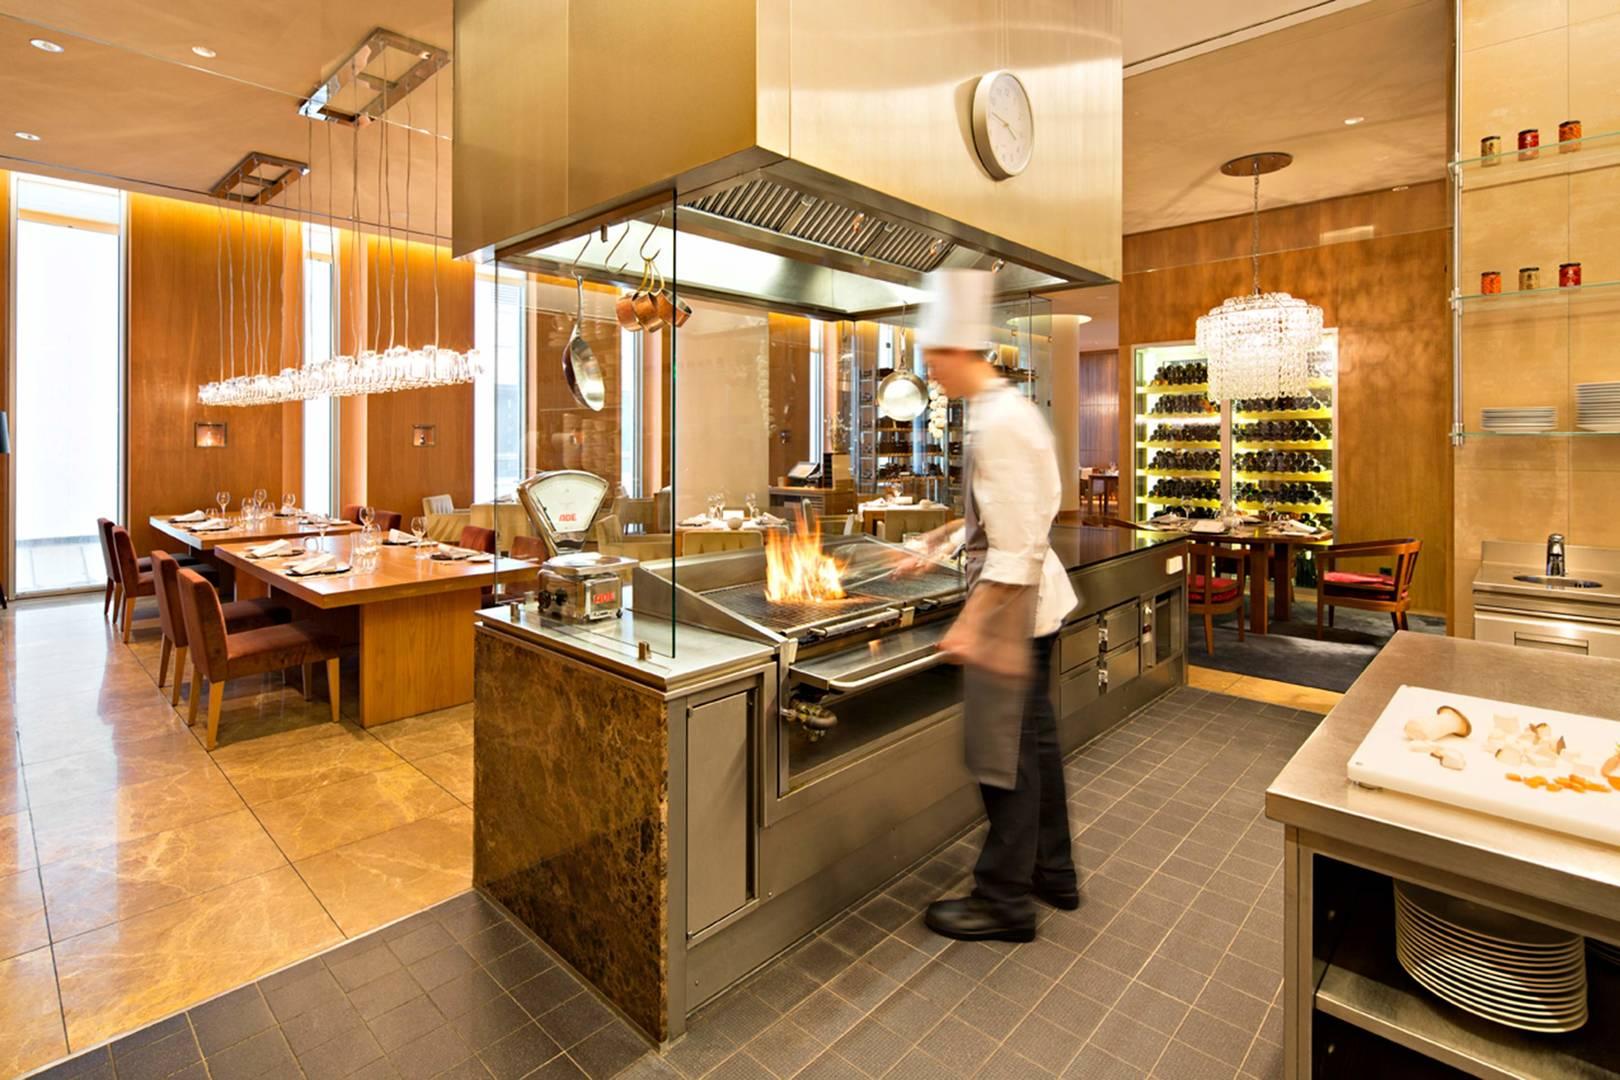 https://cdn.jumeirah.com/-/mediadh/DH/Hospitality/Jumeirah/Restaurants/Frankfurt/Frankfurt-Max-On-One-Grill-Room/Restaurant-Gallery/JumeirahFrankfurtMaxonOne364.jpg?h=1080&w=1620&hash=DB8715C784EB0E9E1712DF79B32B4DC2